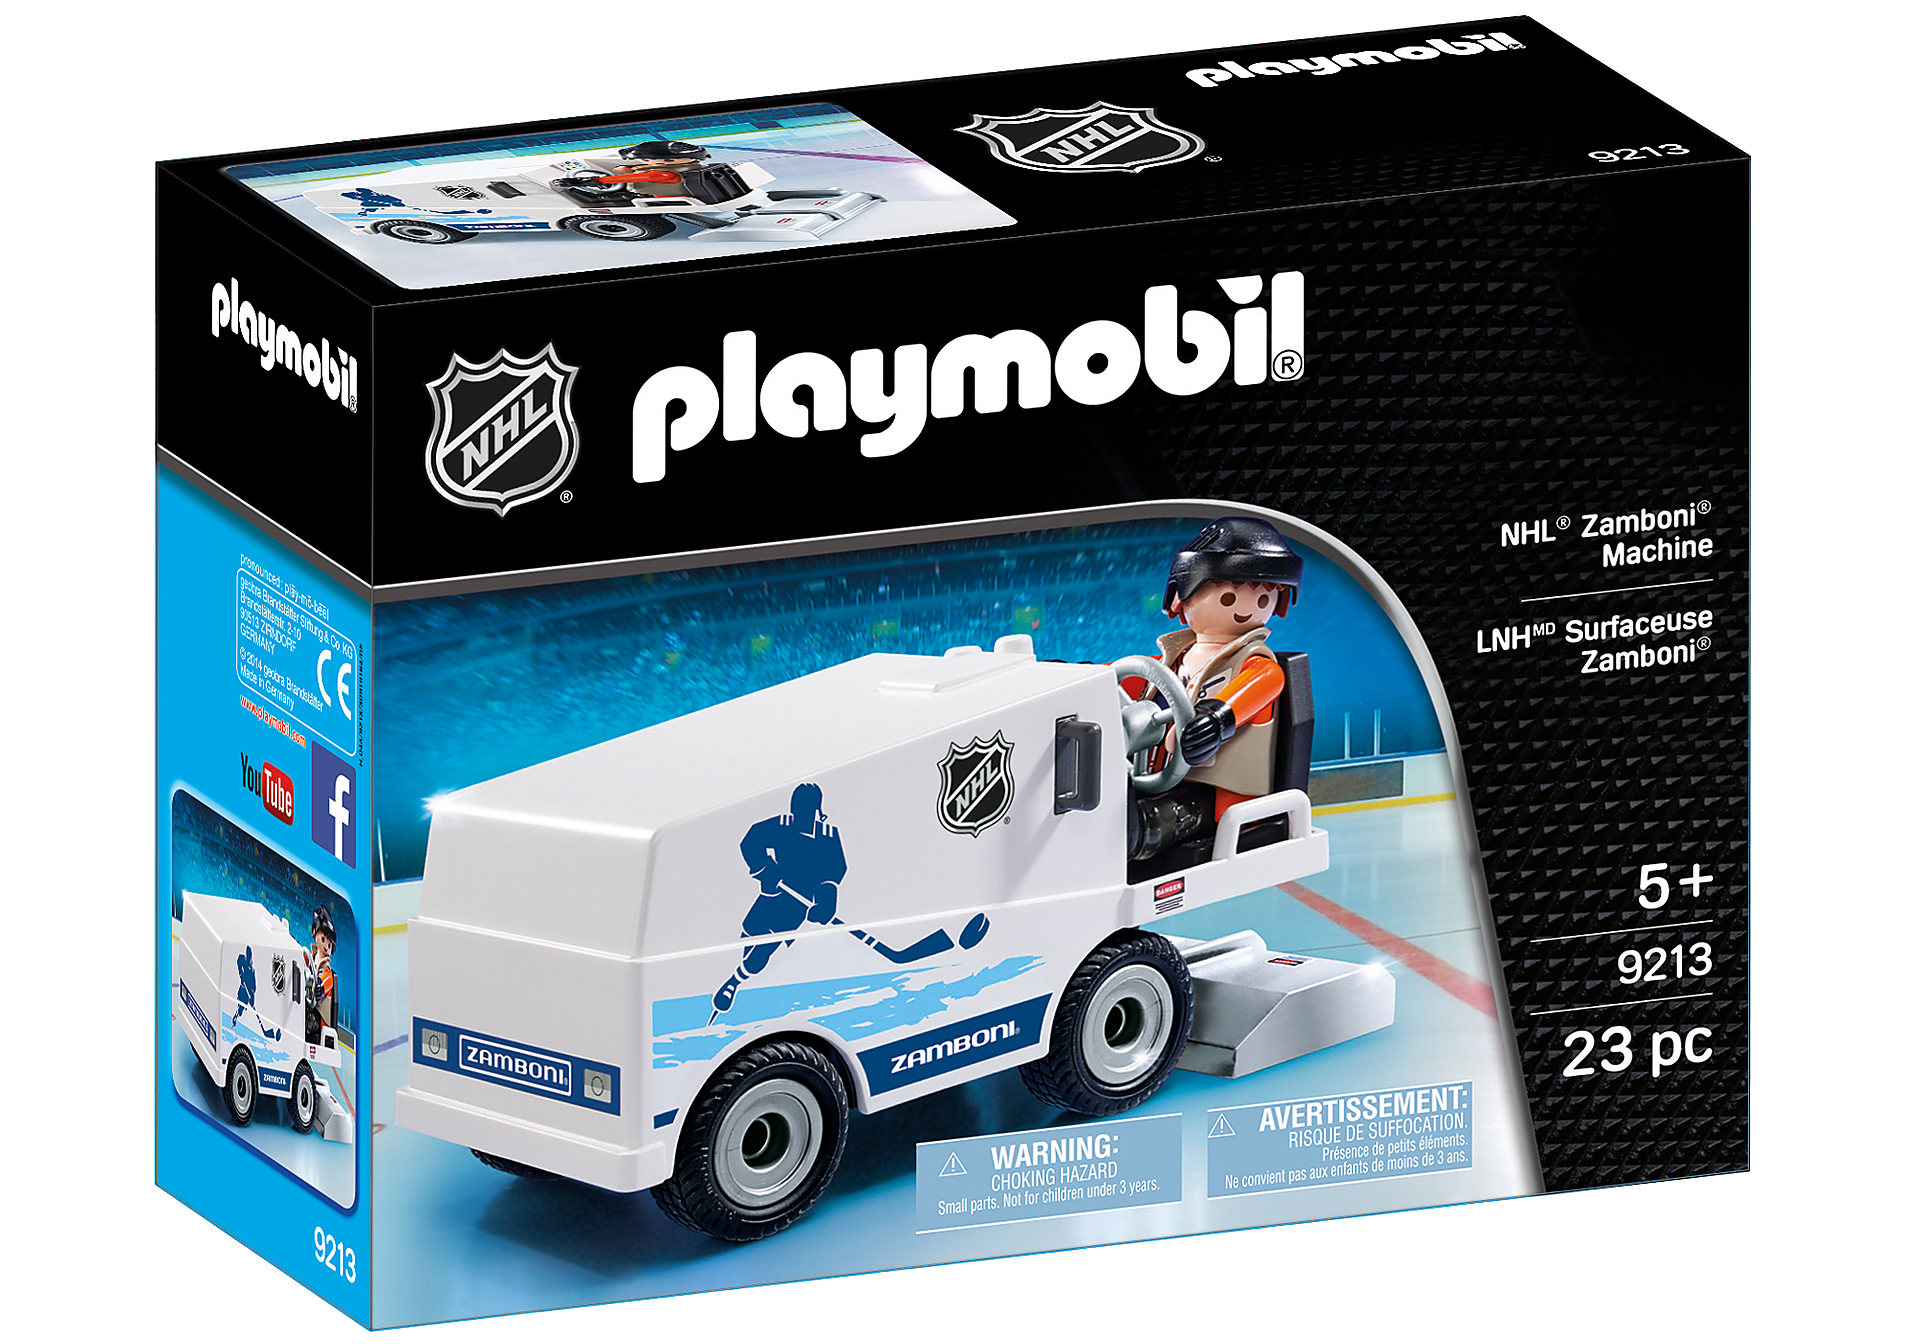 http://media.playmobil.com/i/playmobil/9213_product_box_front/NHL™ Zamboni® Machine